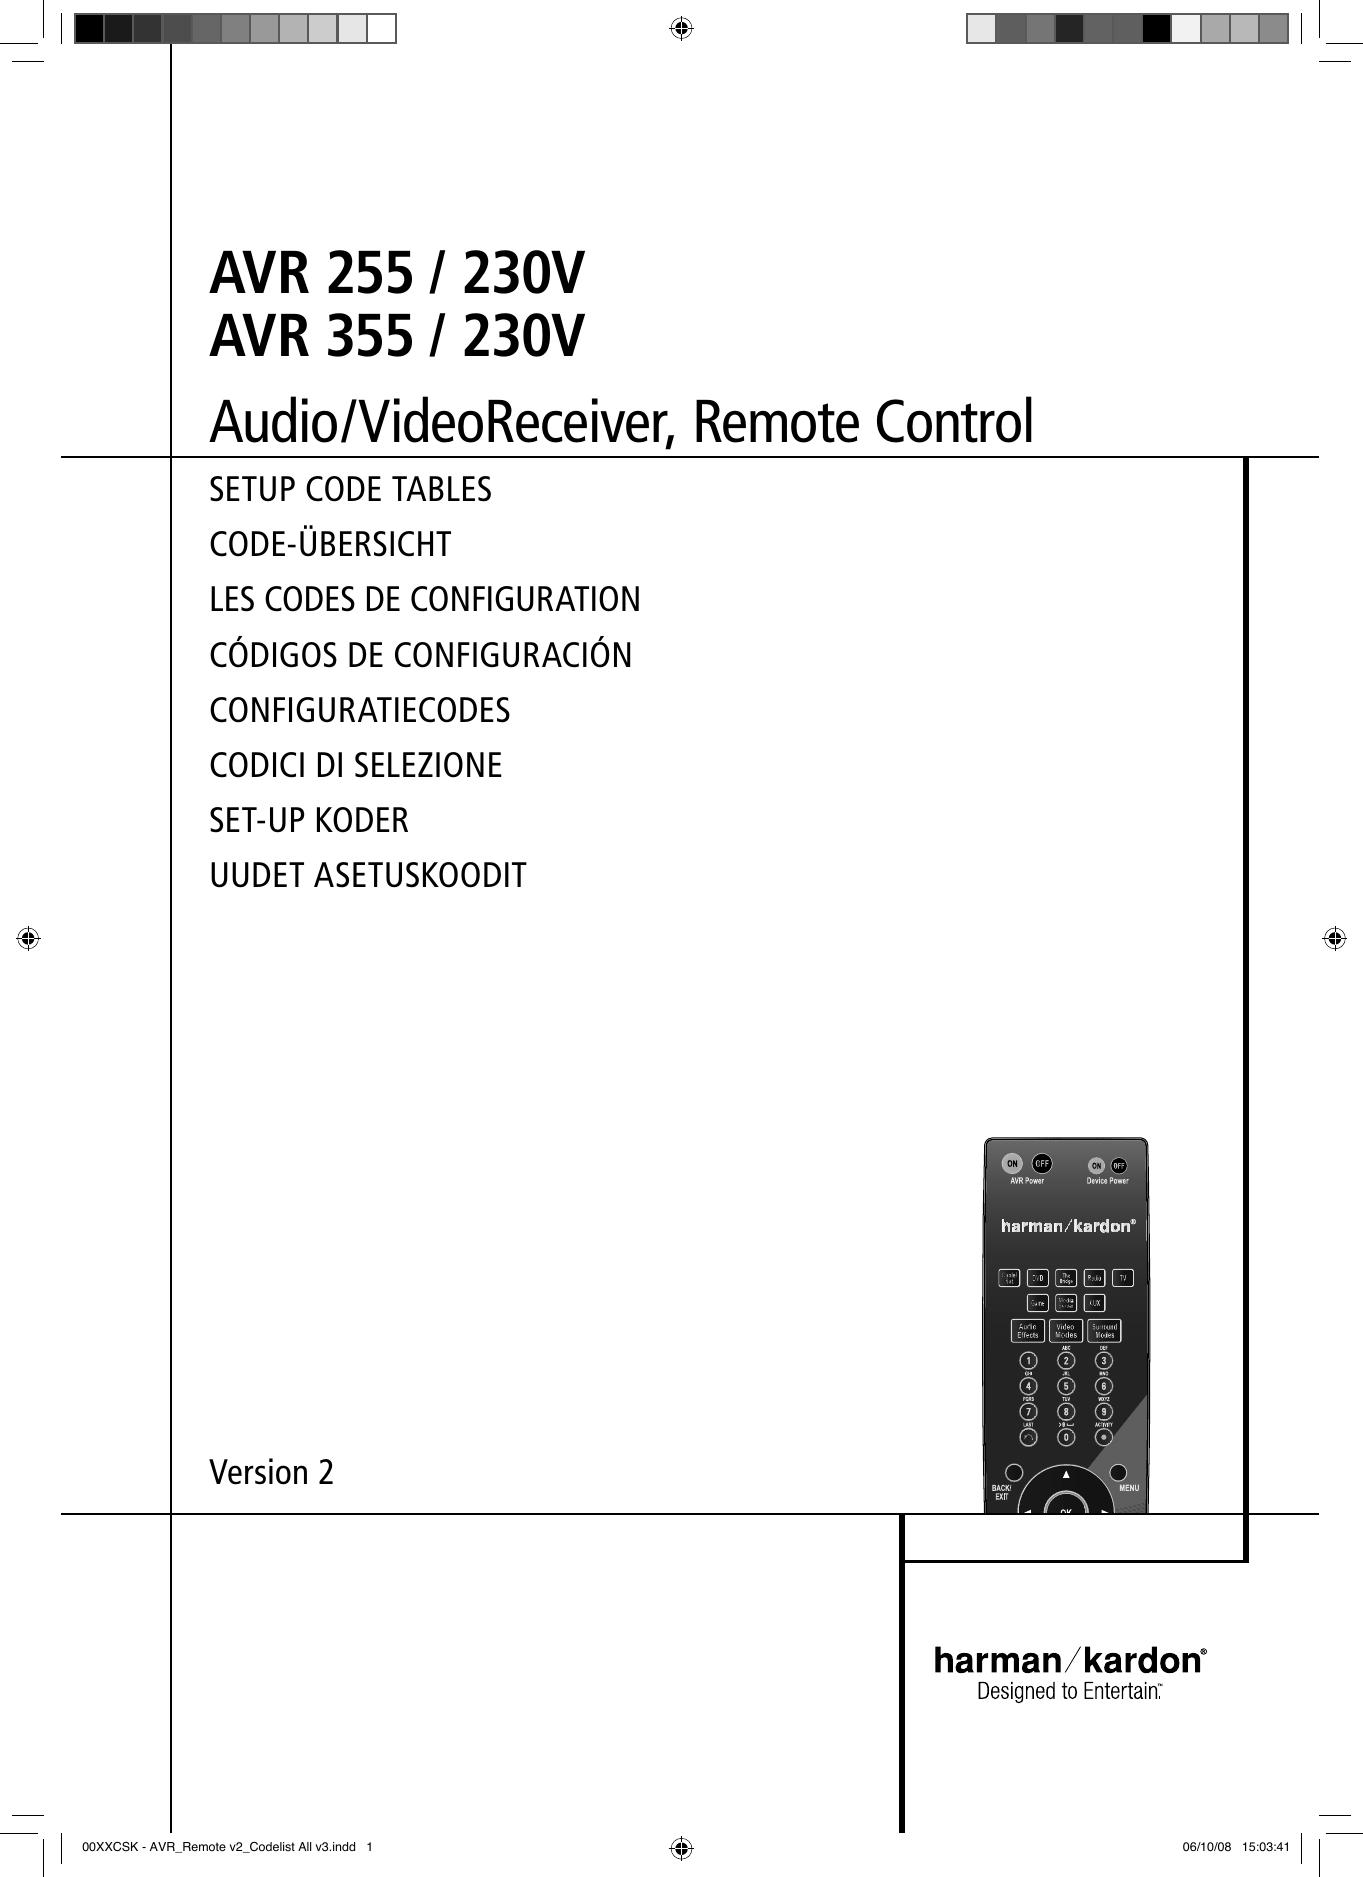 Harman kardon avr 255 instruction manual array harman kardon avr 255 230v users manual rh usermanual wiki fandeluxe Images